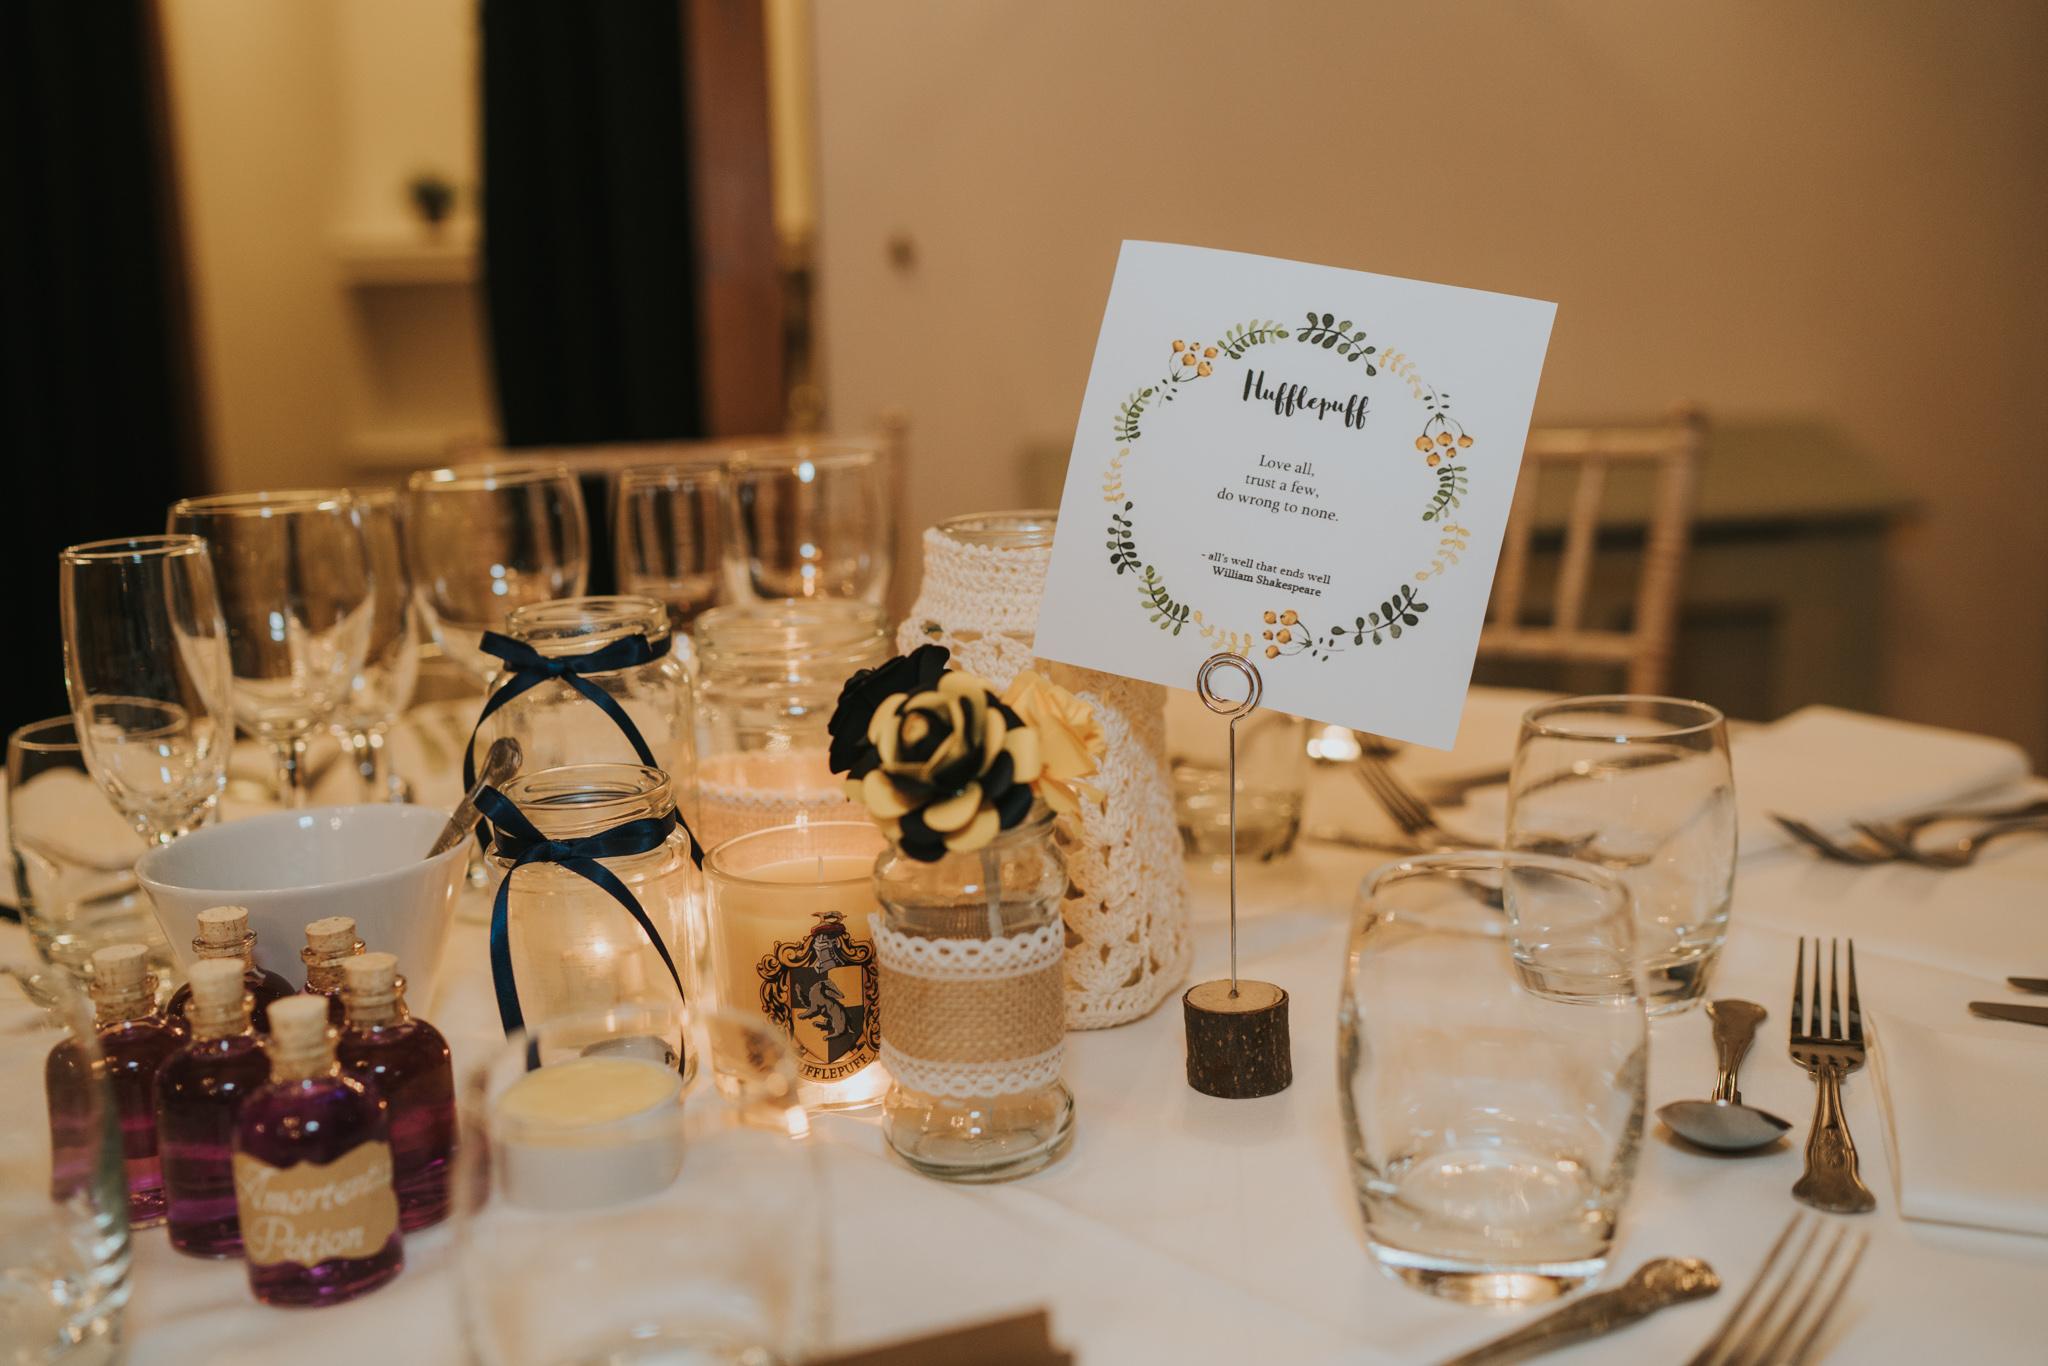 rhia-james-rustic-crabbs-barn-vintage-50s-retro-wedding-grace-elizabeth-colchester-essex-alternative-relaxed-wedding-family-photography-devon-suffolk-norfolk-essex (104 of 138).jpg